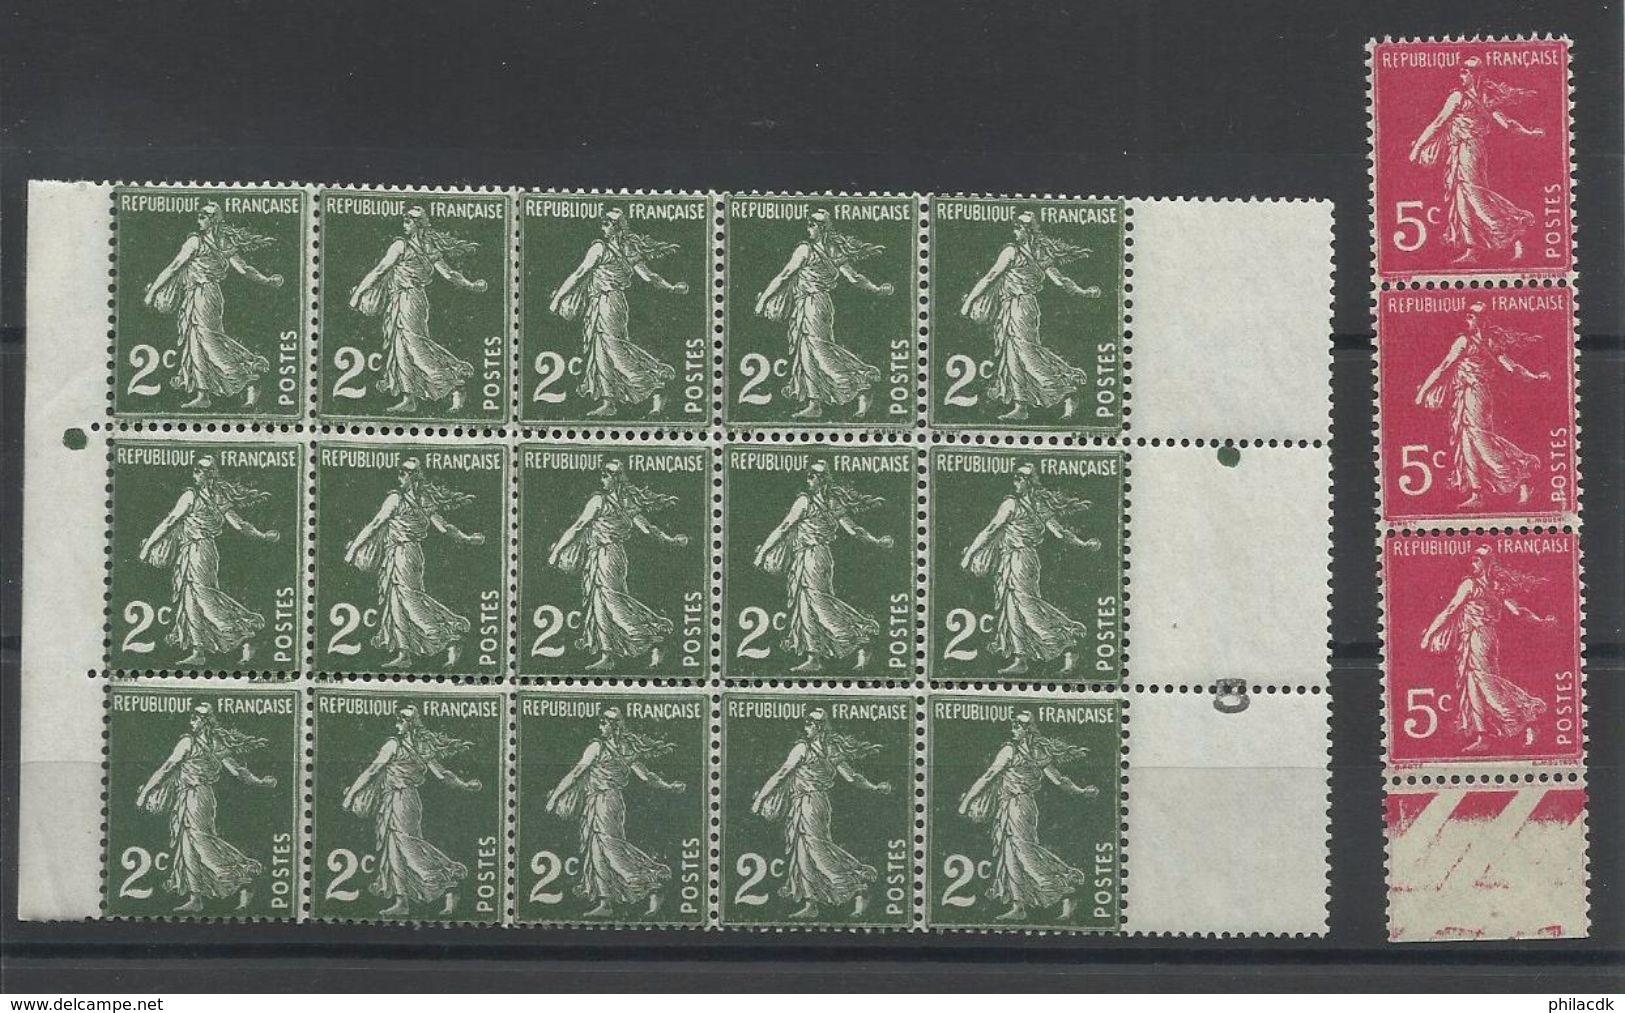 FRANCE - 44 SCANNS -LOT DE 382 SEMEUSE CAMEE NEUFS** SANS CHARNIERE/ NEUFS* AVEC CHARNIERE/NEUFS (*) SANS GOMME - 1906-38 Sower - Cameo